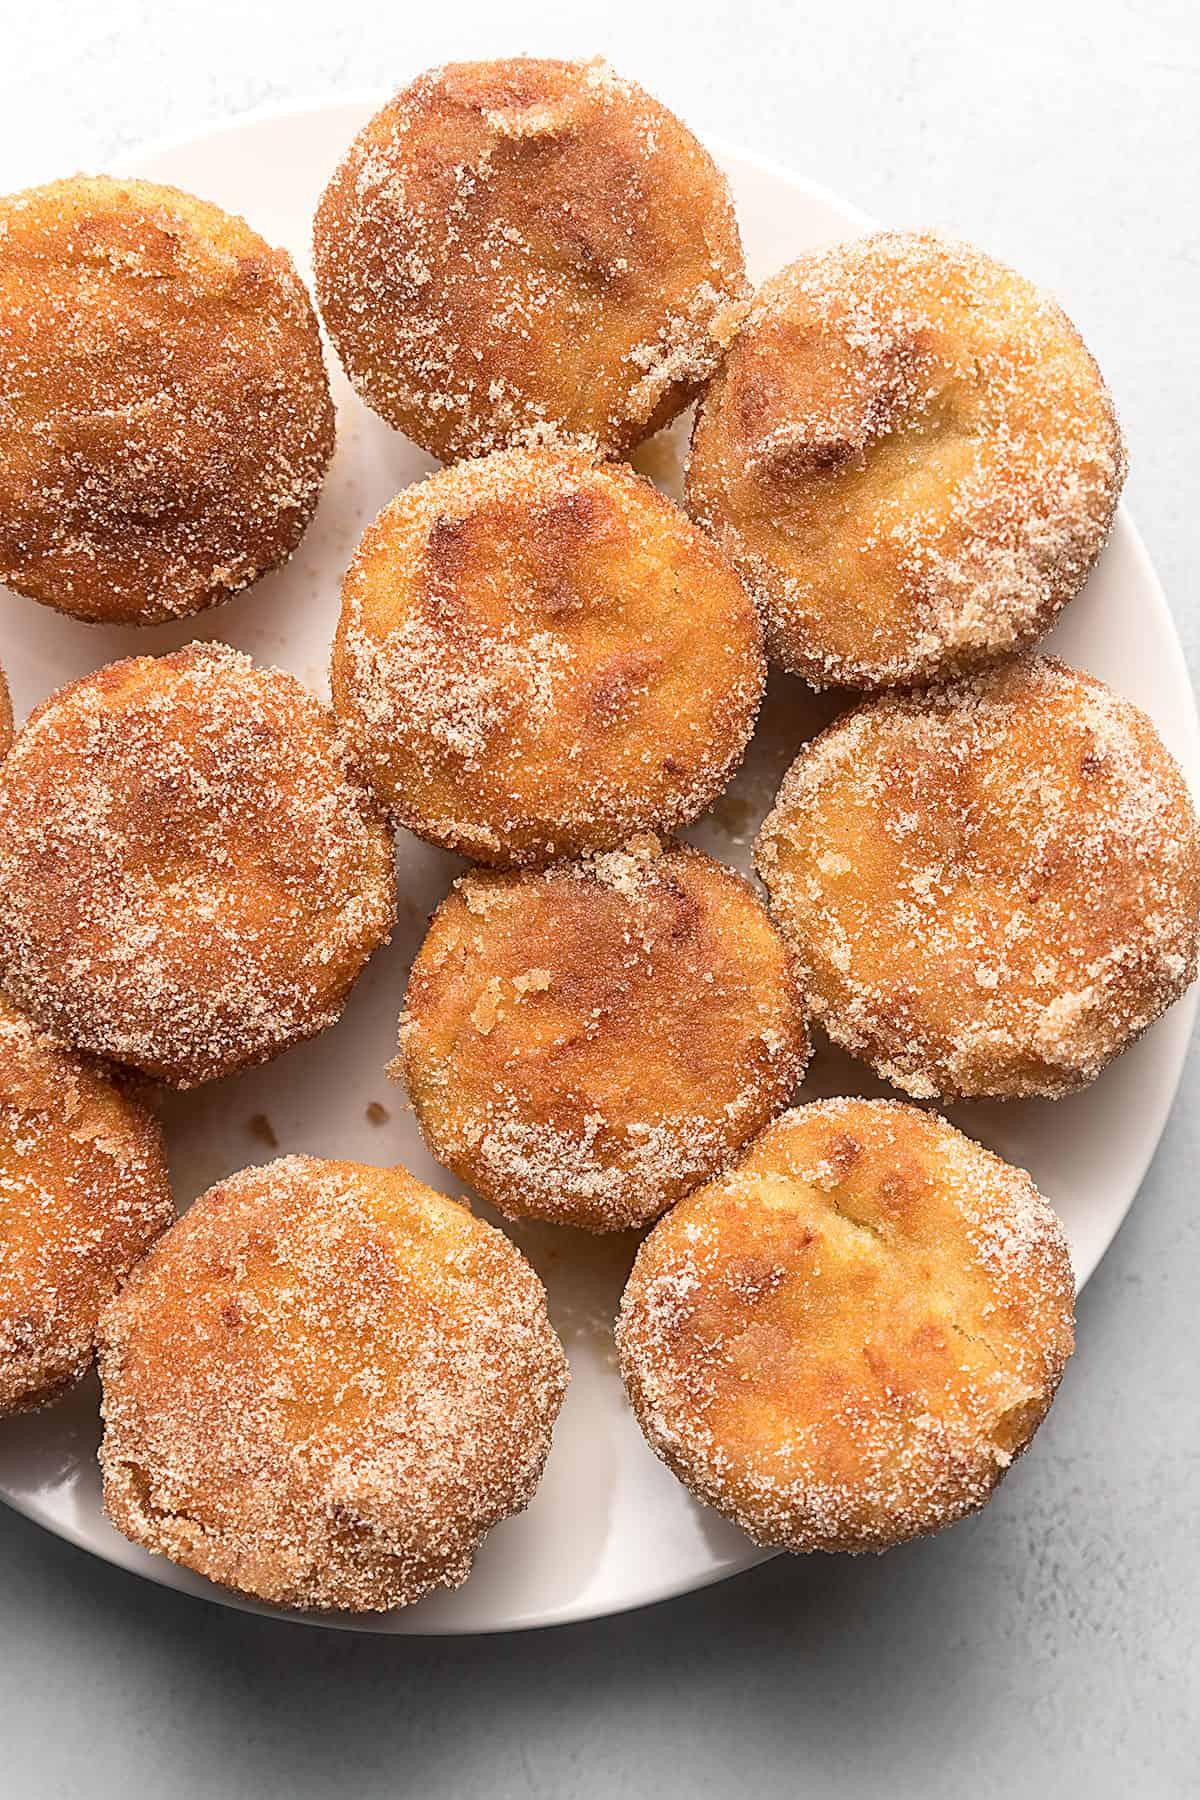 keto cinnamon muffins on a white plate